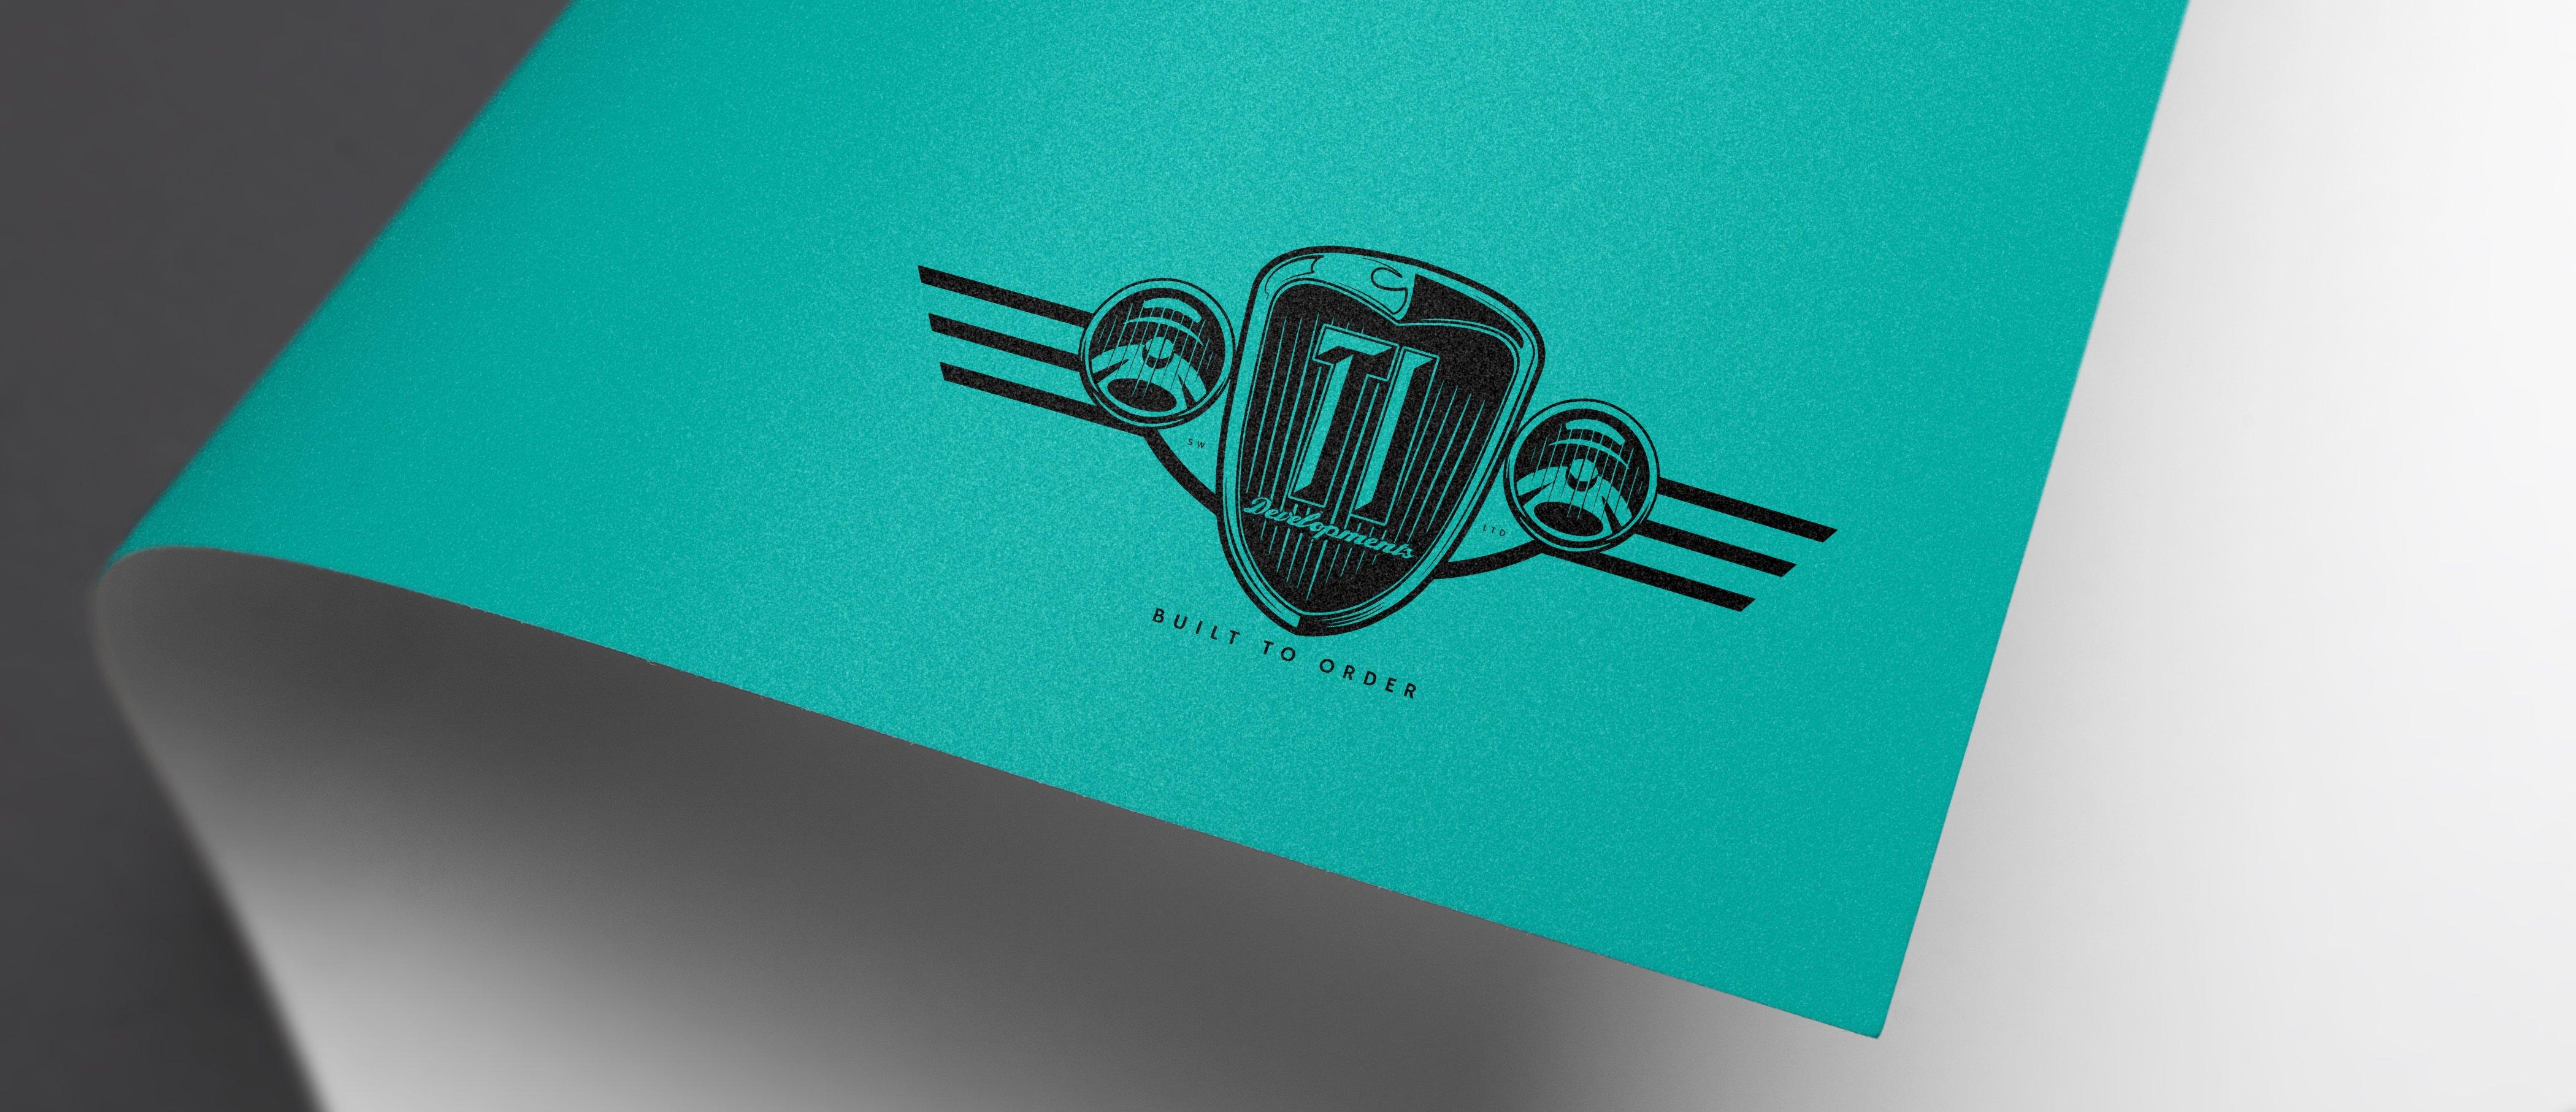 TI Logo On Green Paper.jpg